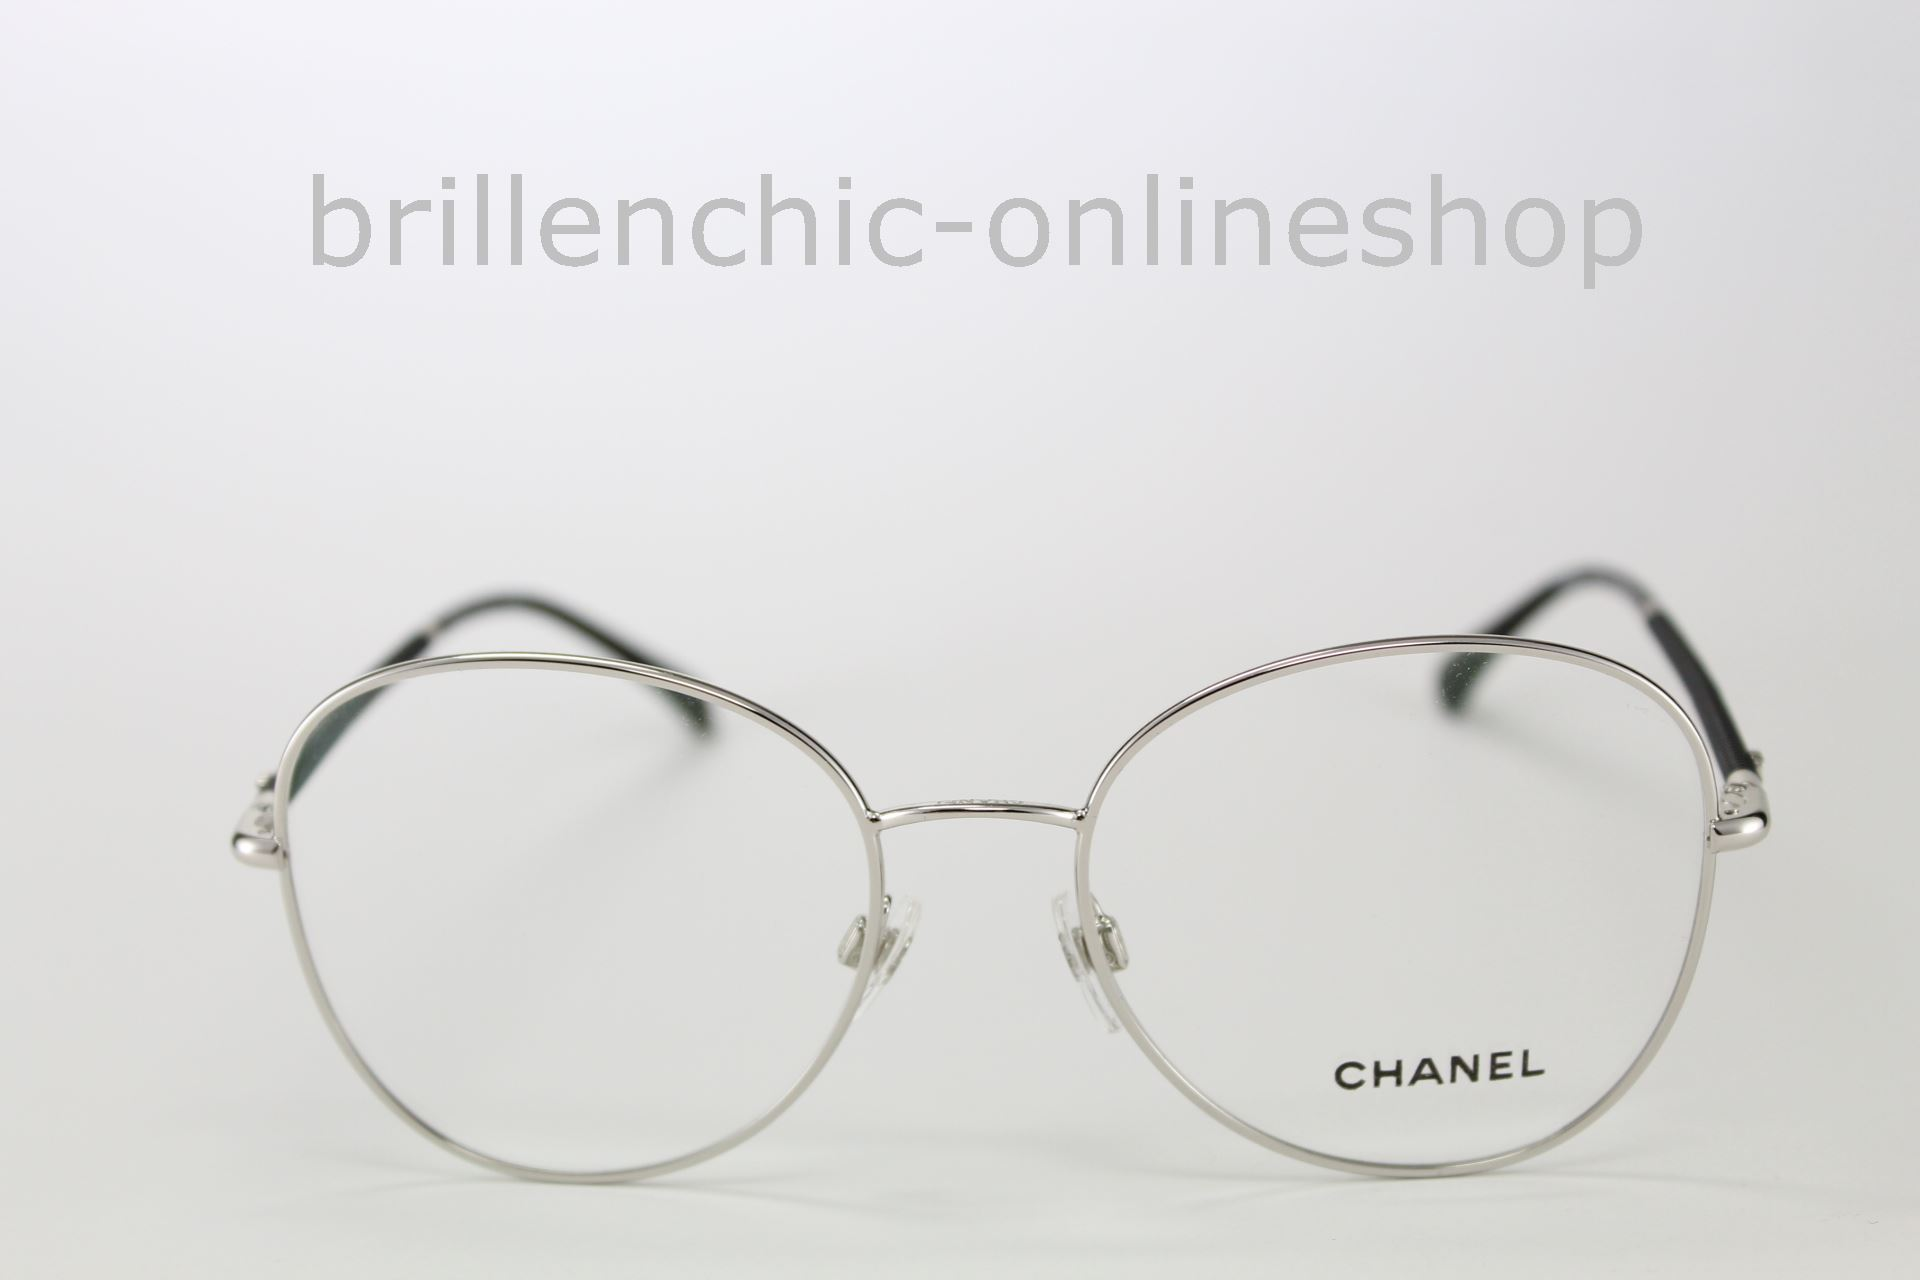 Chanel Berlin brillenchic onlineshop in berlin chanel ch 2178 c124